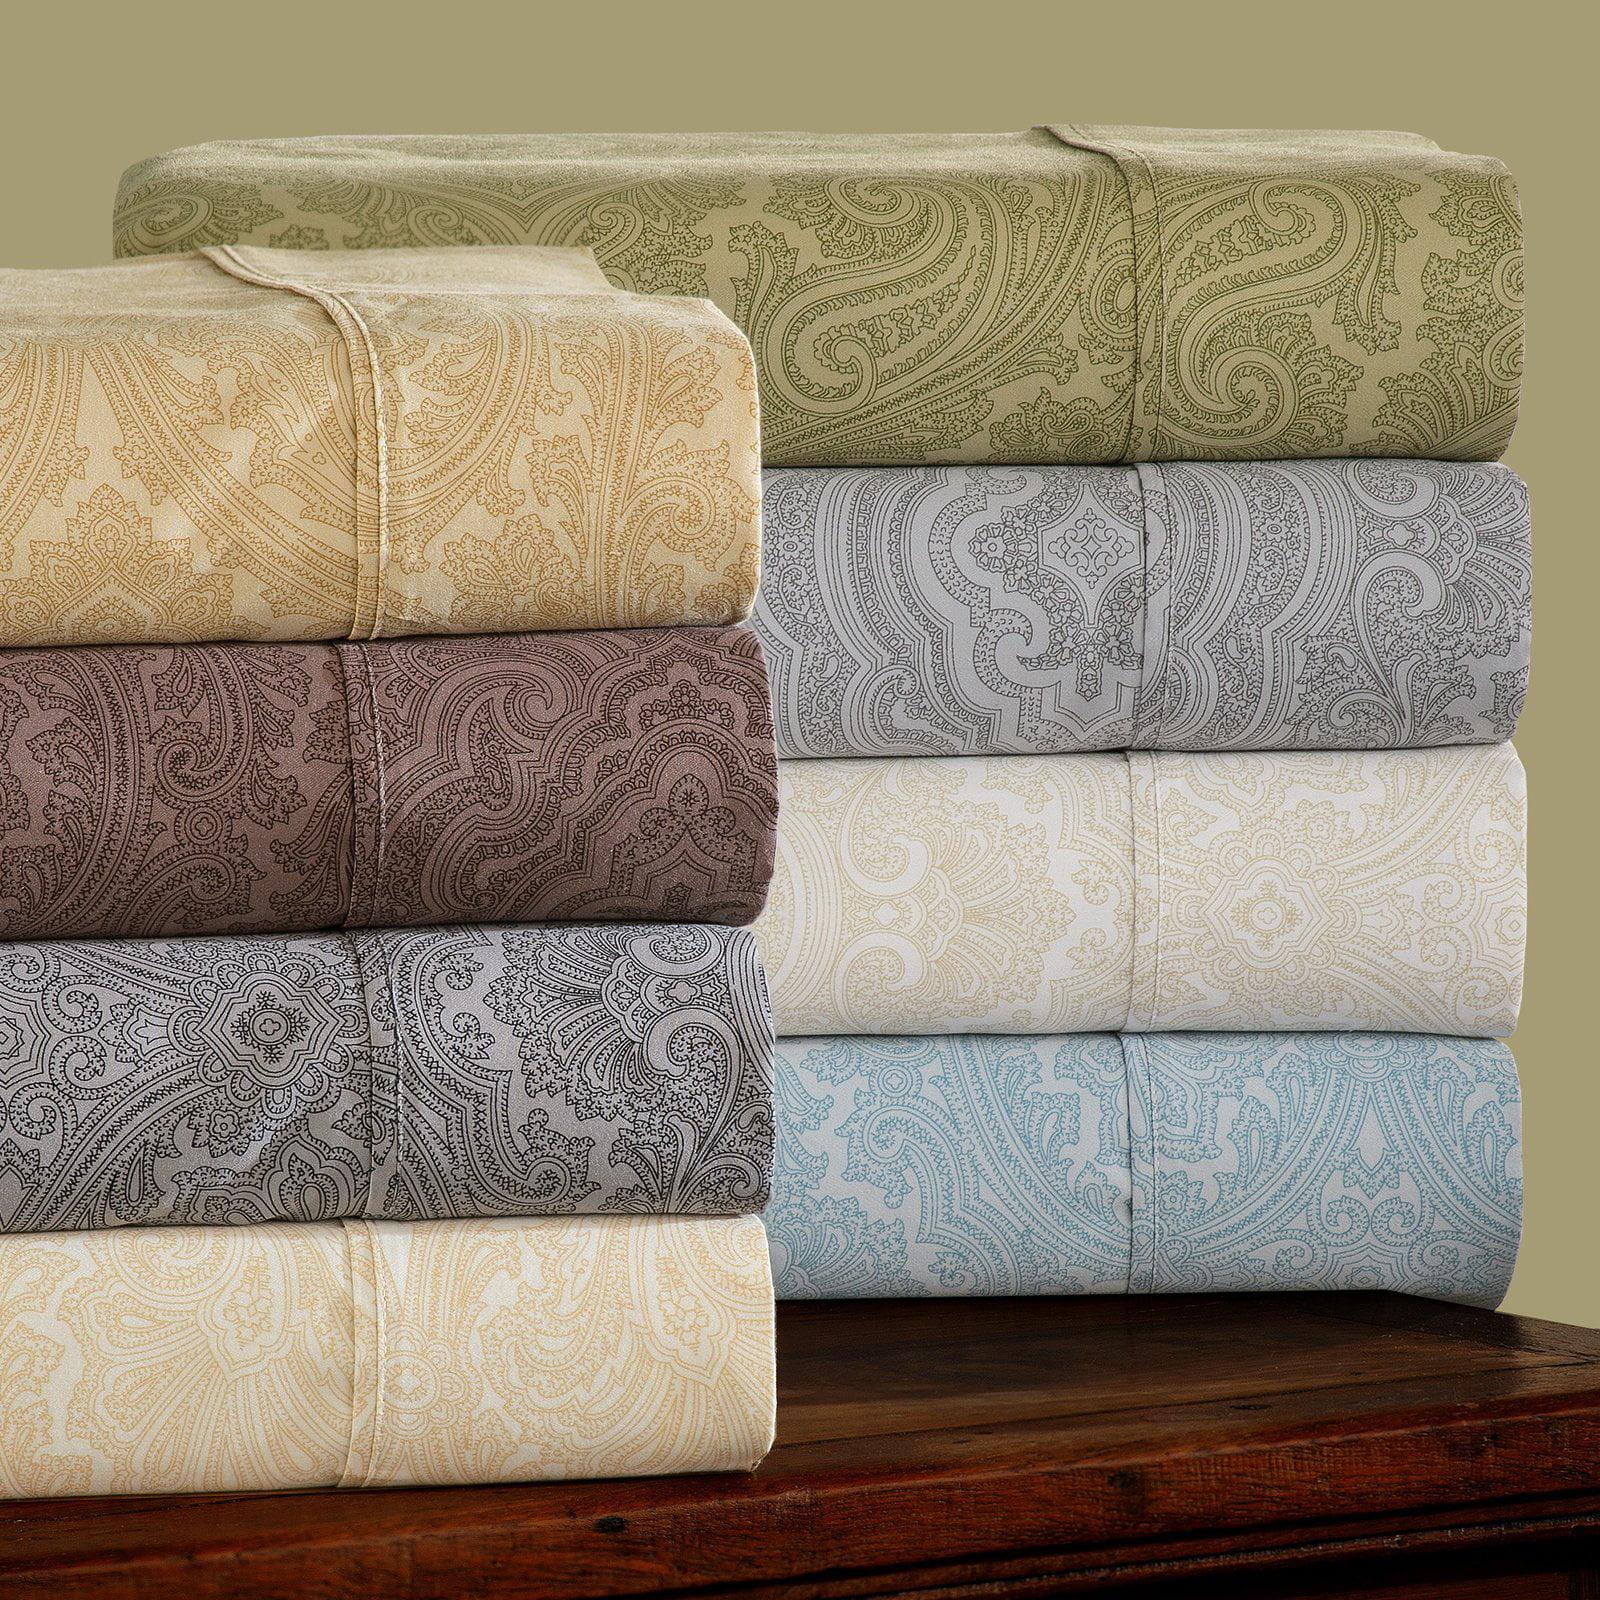 Superior 600 Thread Count Wrinkle Resistant Luxury Cotton Italian